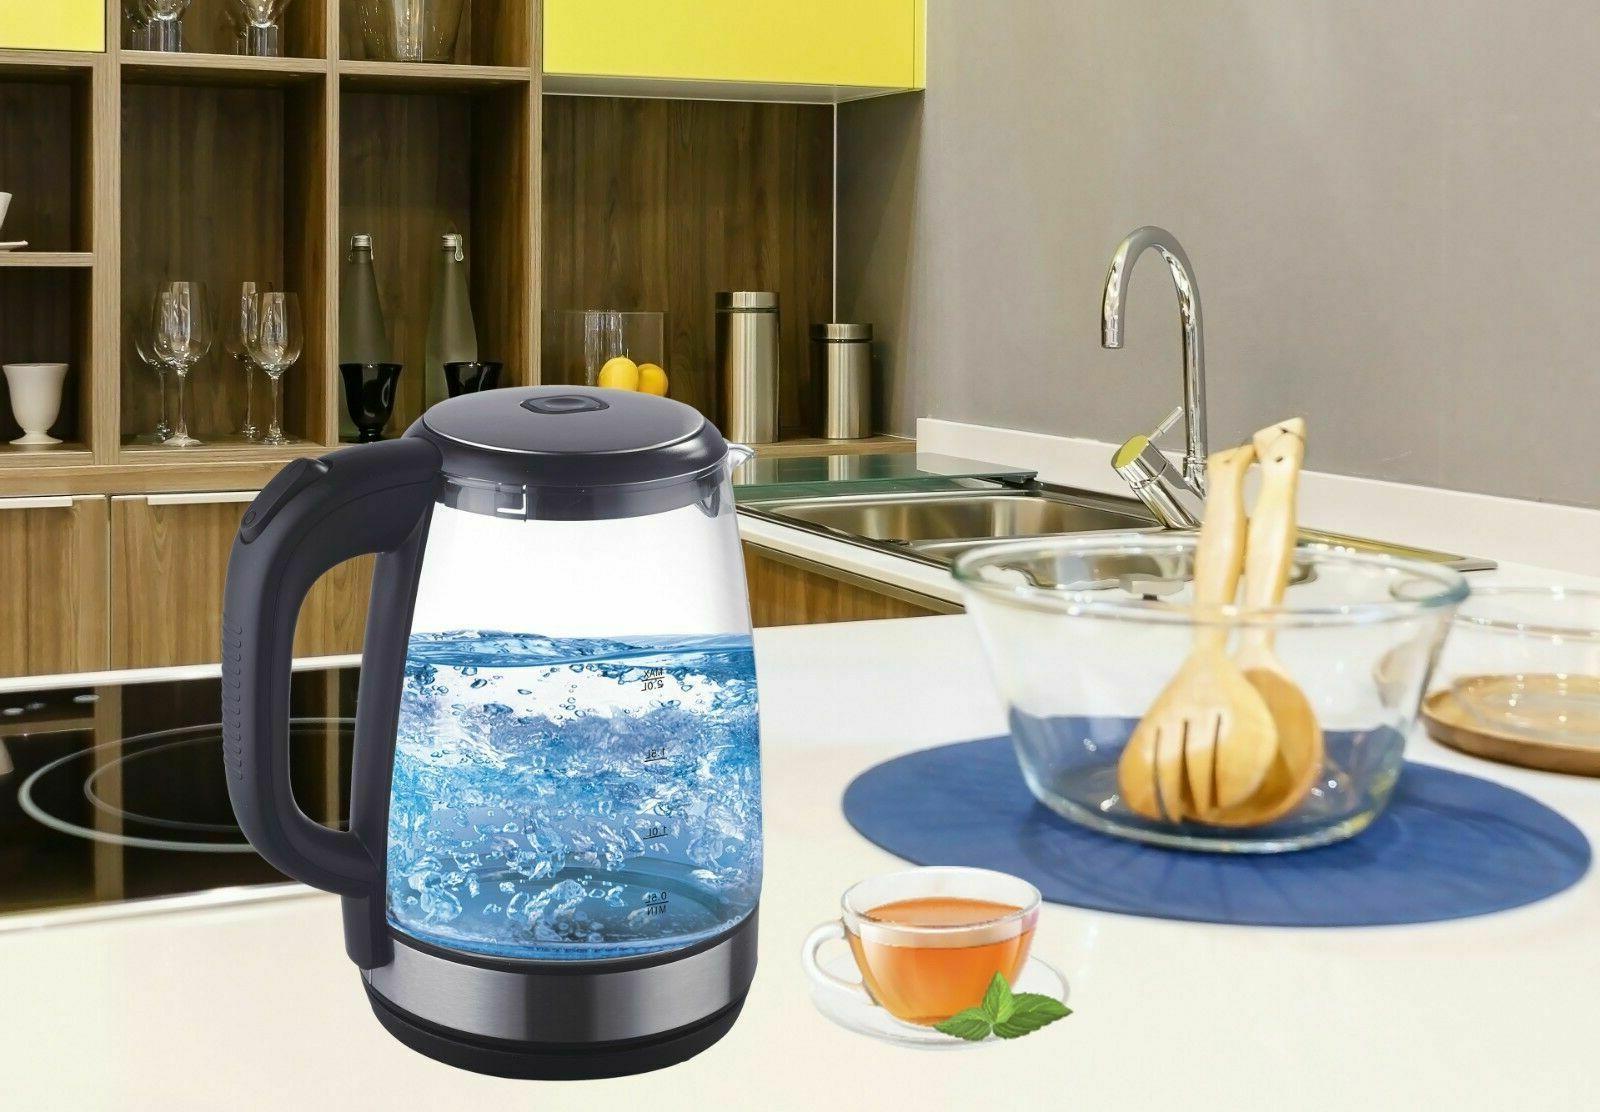 Electric Boiler Boiling Kettle w/Blue Illumination